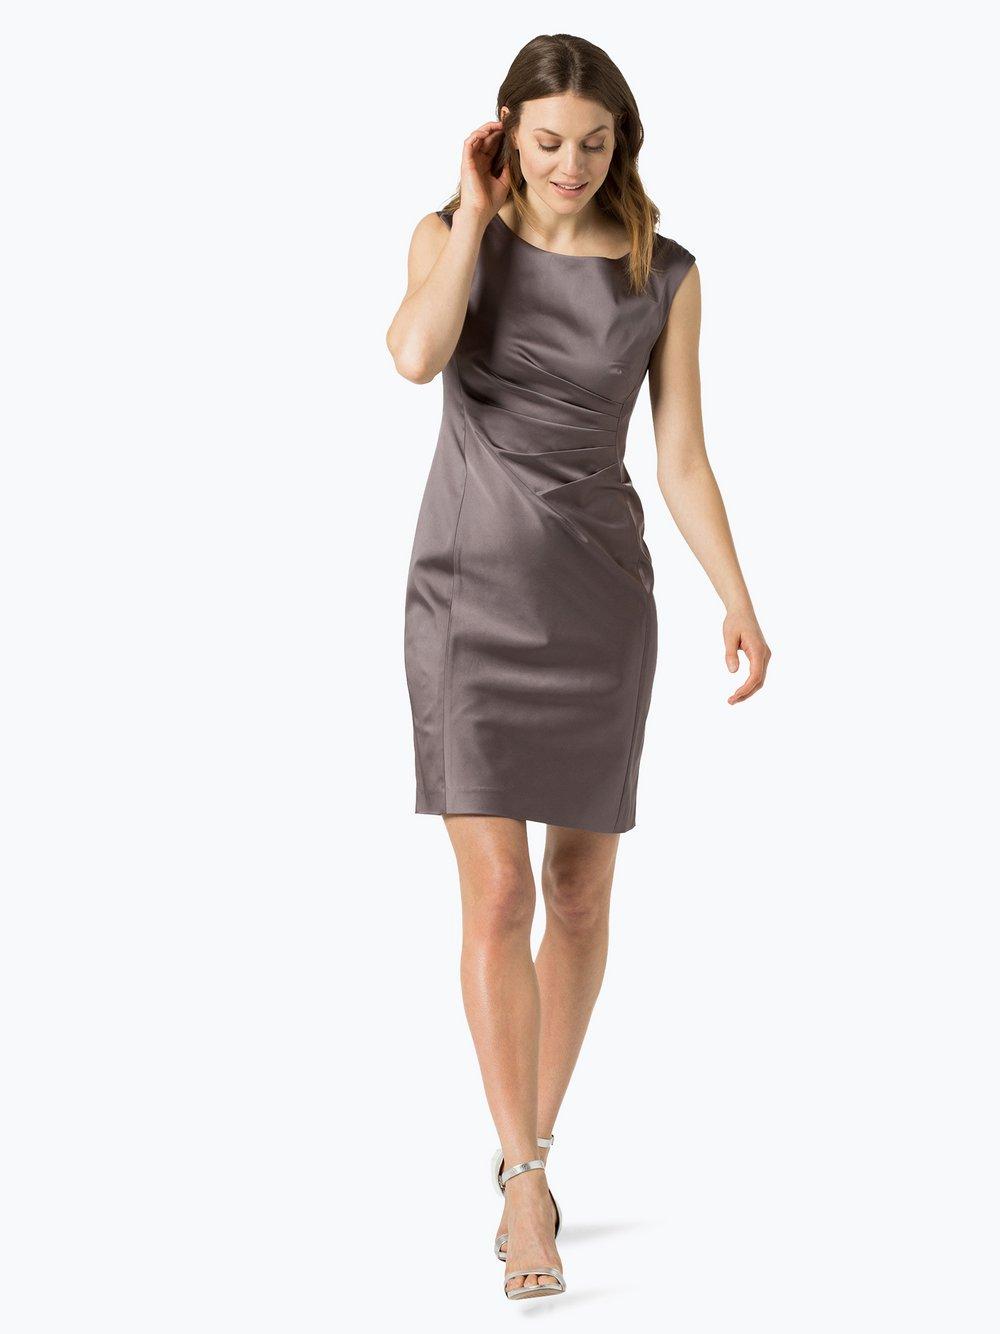 Ambiance – Damska sukienka wieczorowa, beżowy Van Graaf 106920-0011